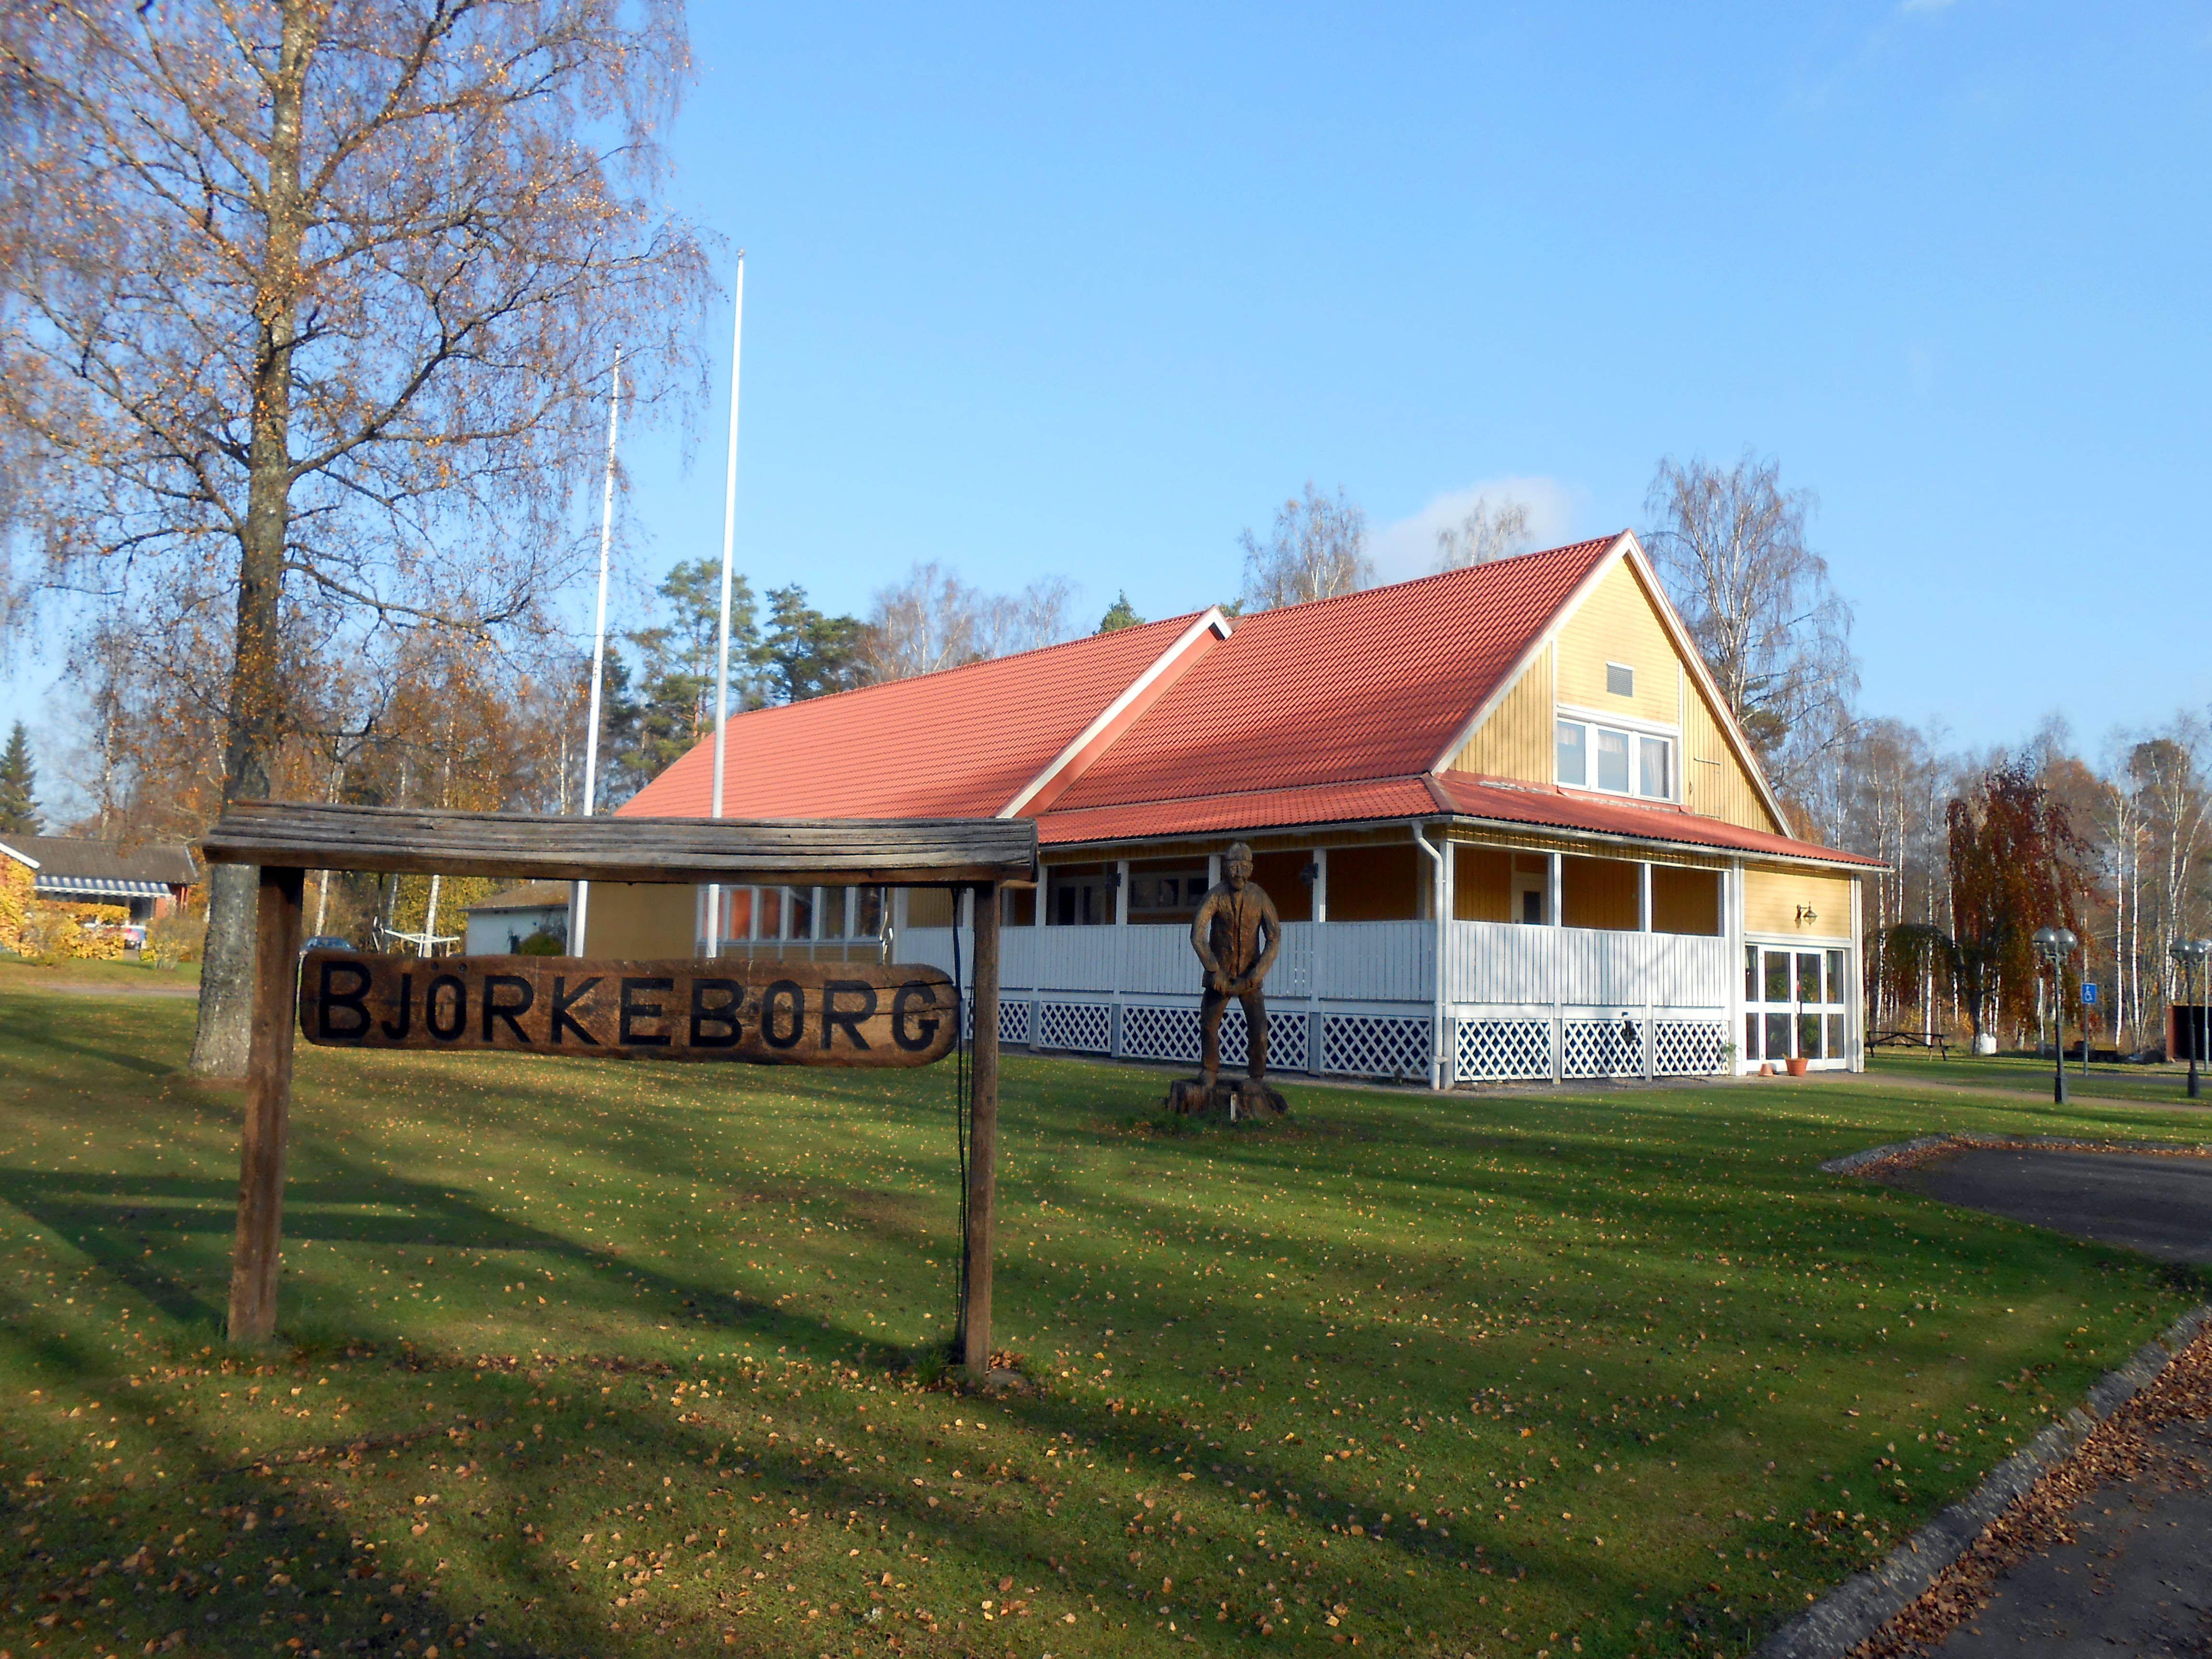 Loppis i Björkeborg Väckelsång